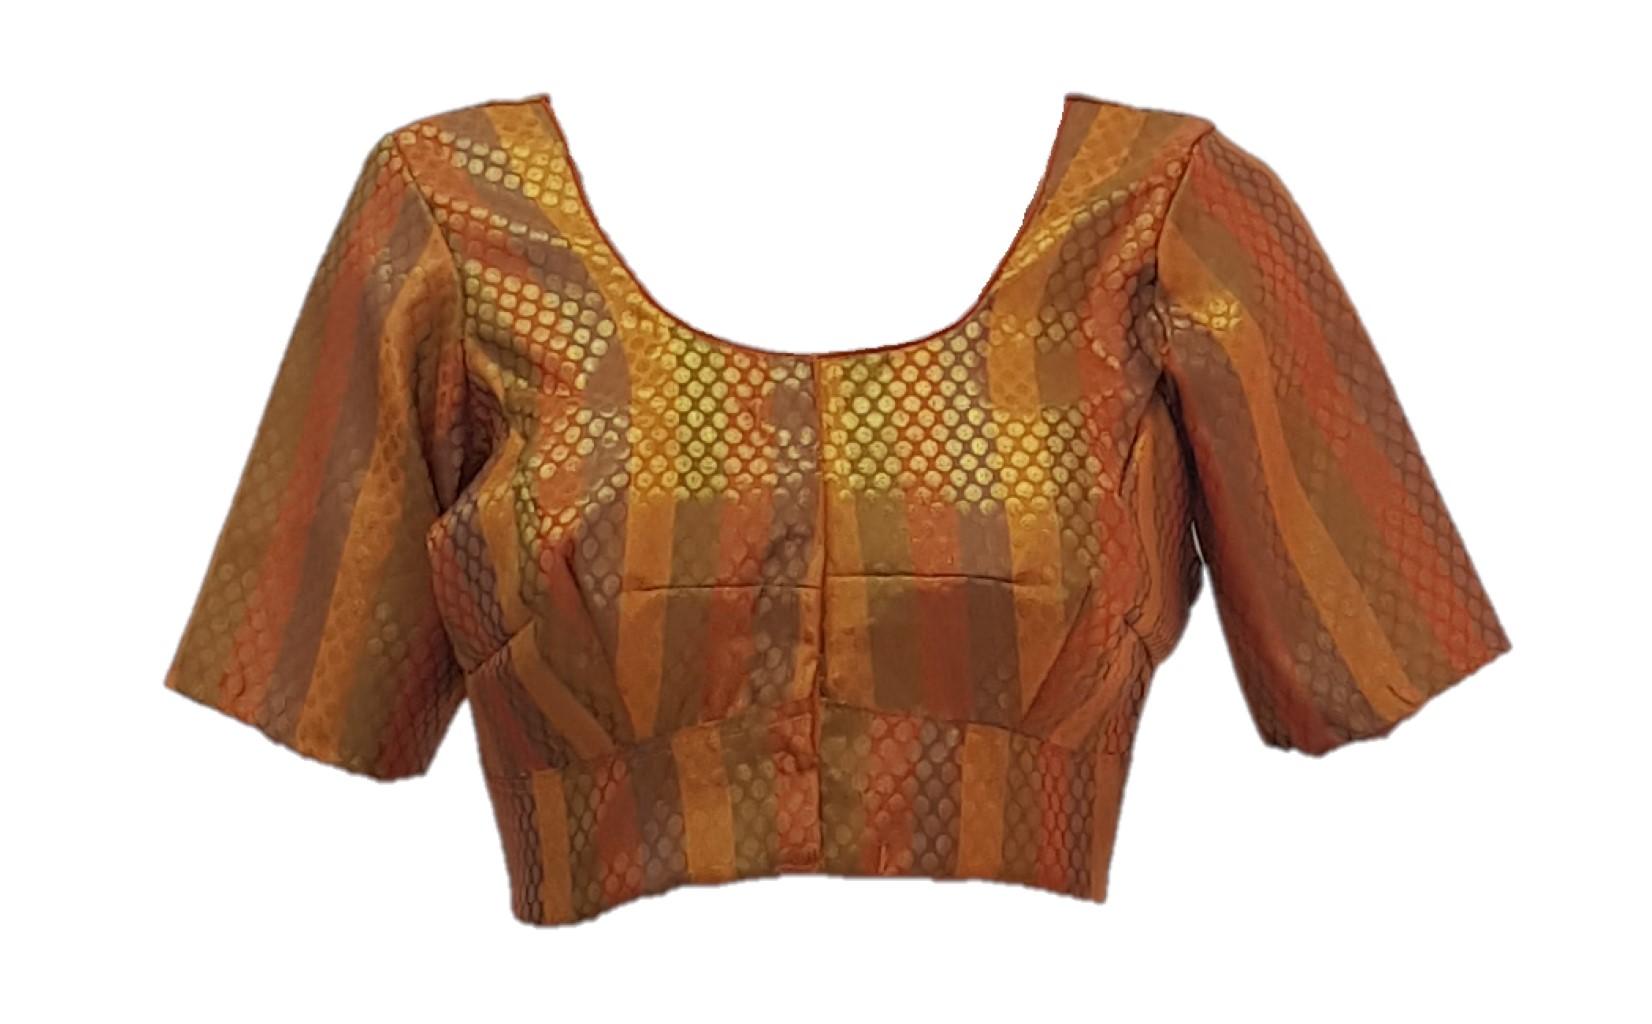 Art Silk Fabric Jari Work Readymade Saree Blouse Yellow Size Medium : Picture